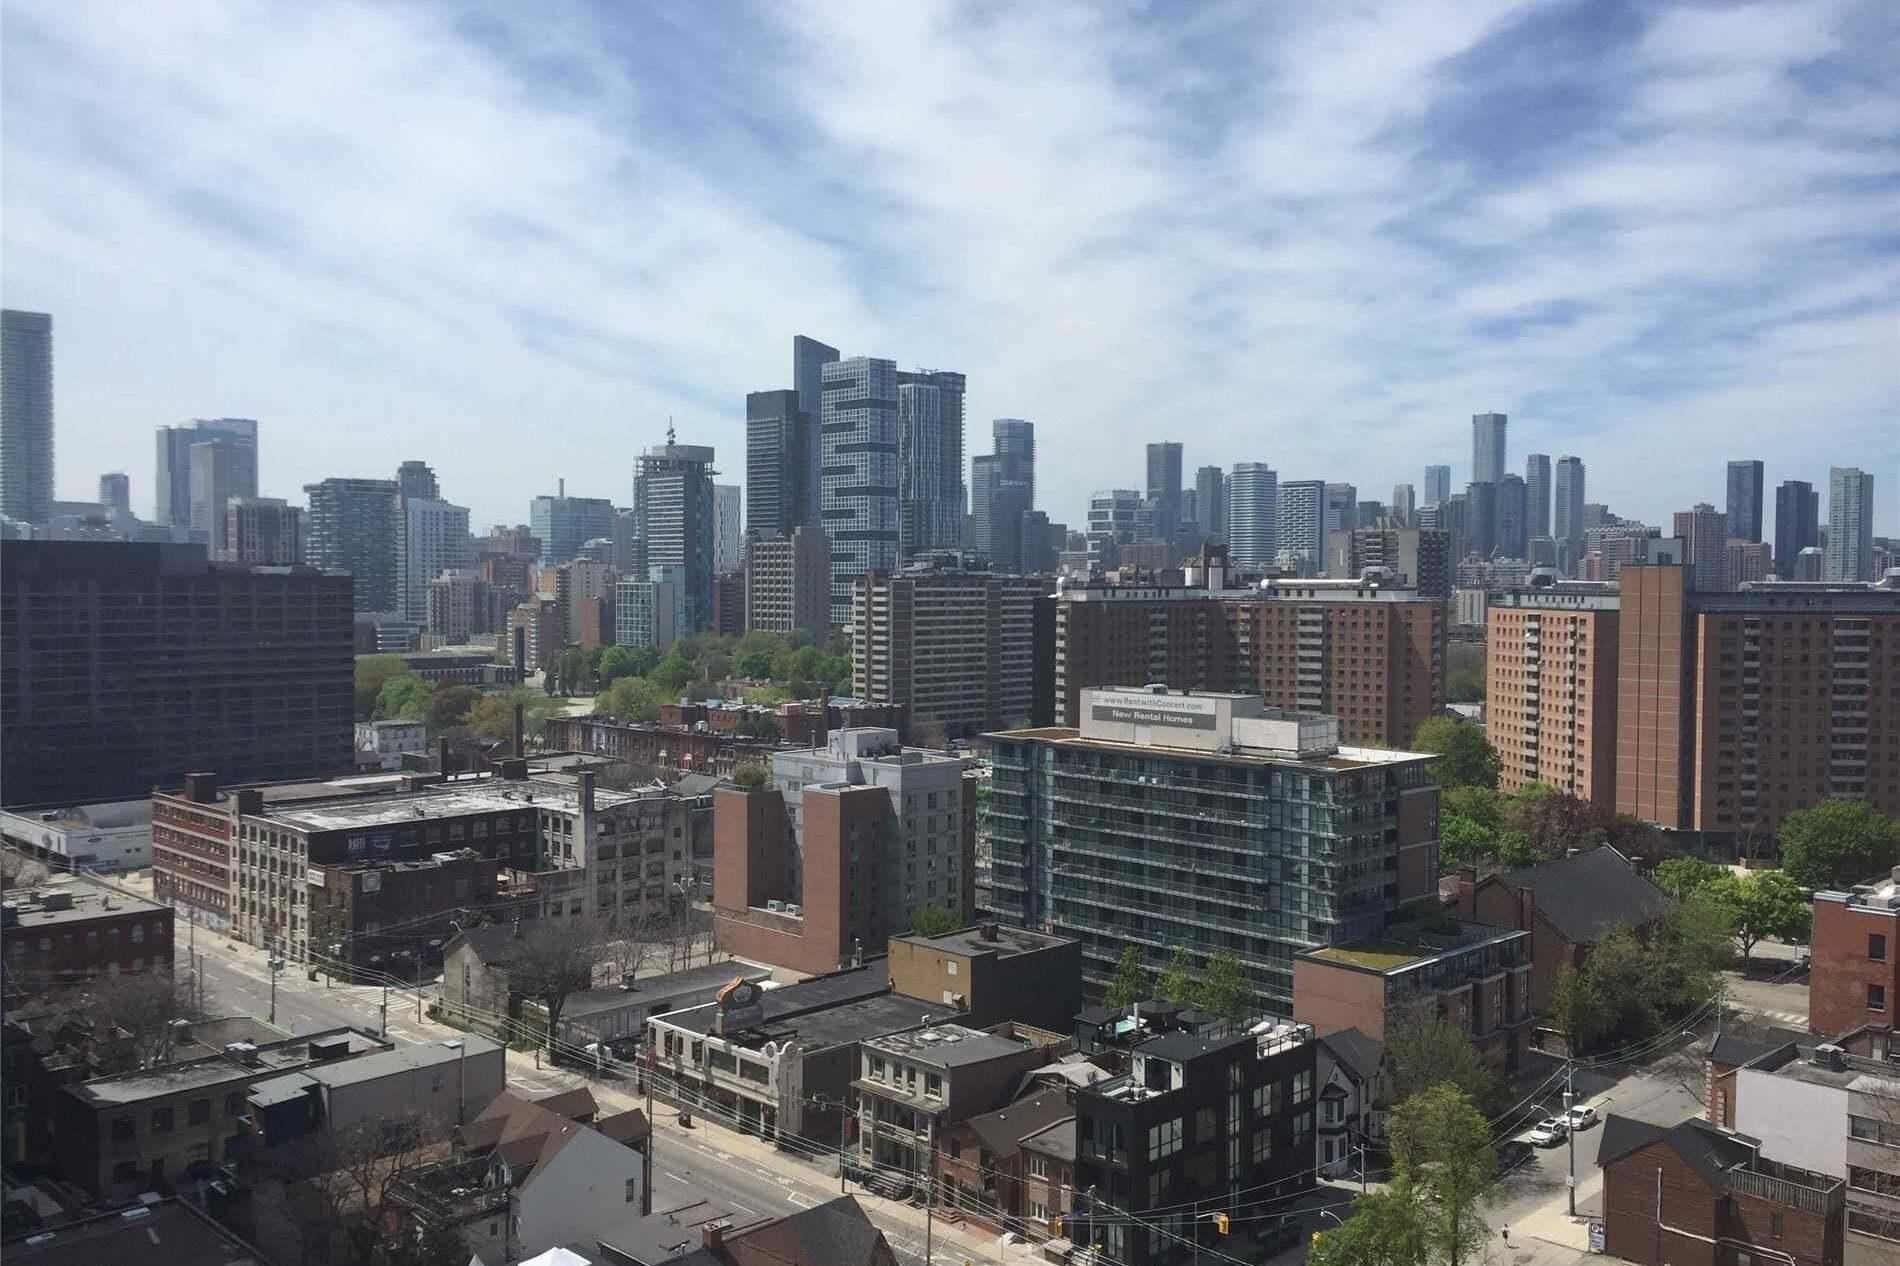 Buliding: 120 Parliament Street West, Toronto, ON